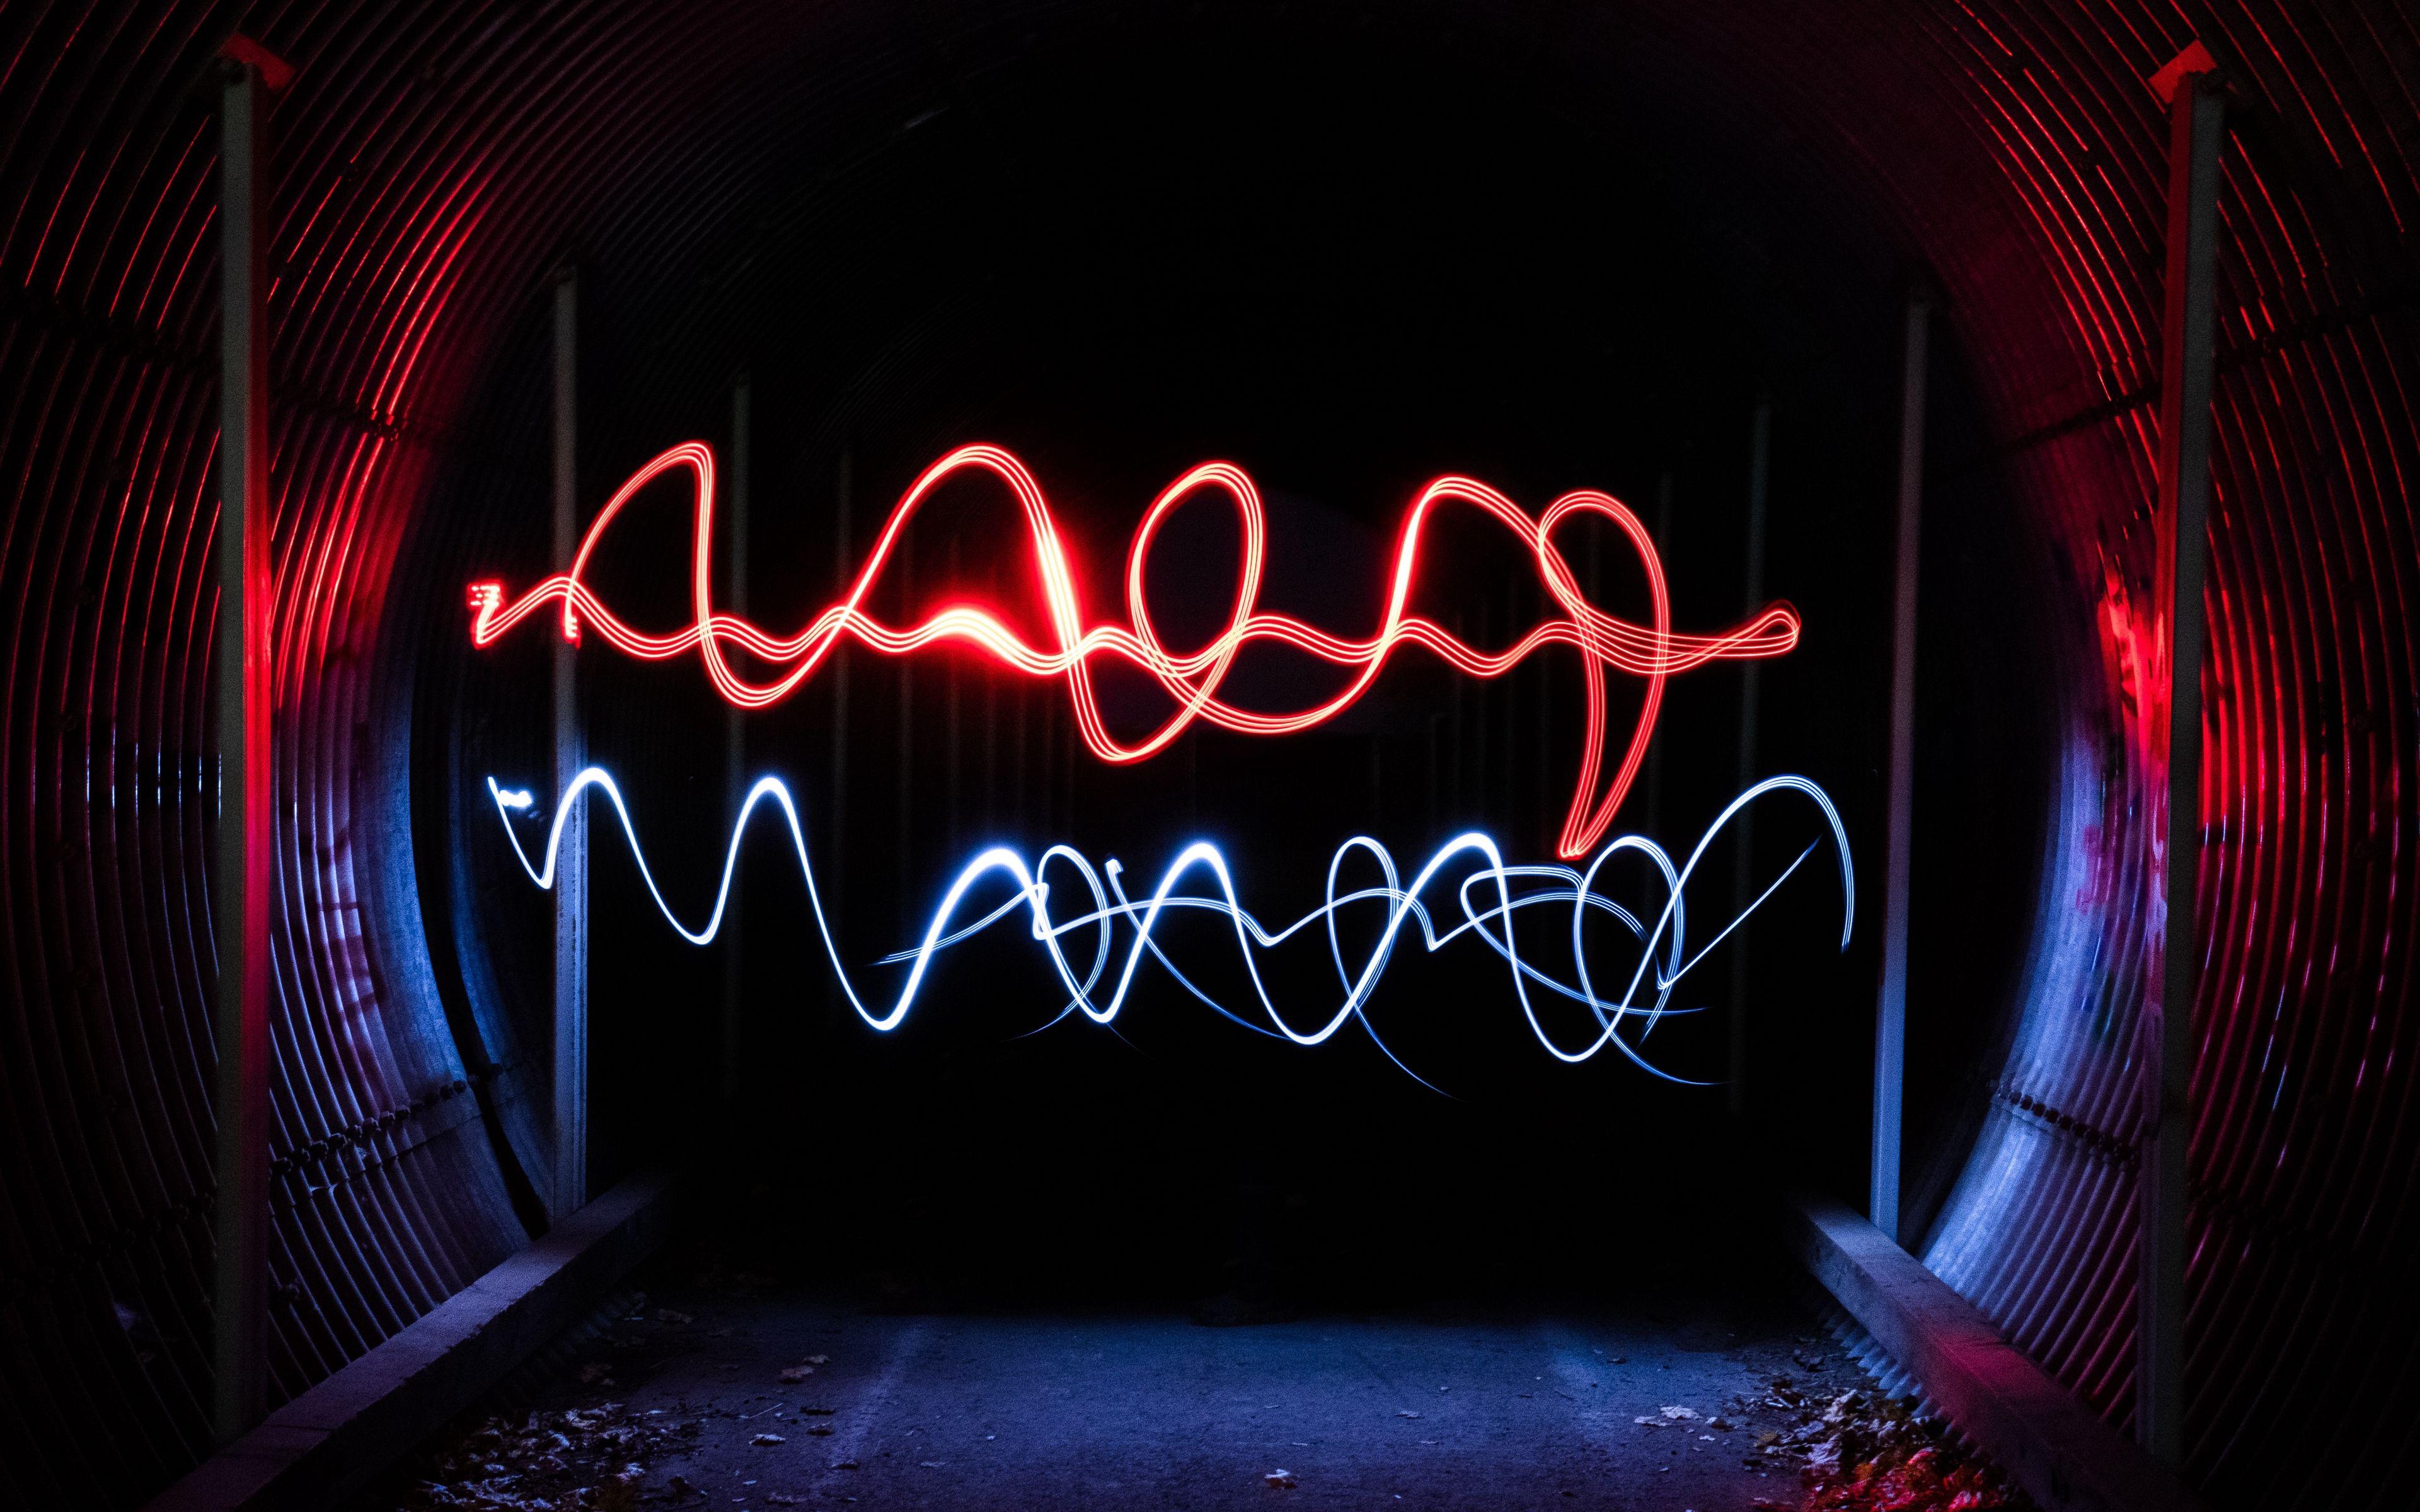 4k Neon Light Sign Wallpapers - Wallpaper Cave